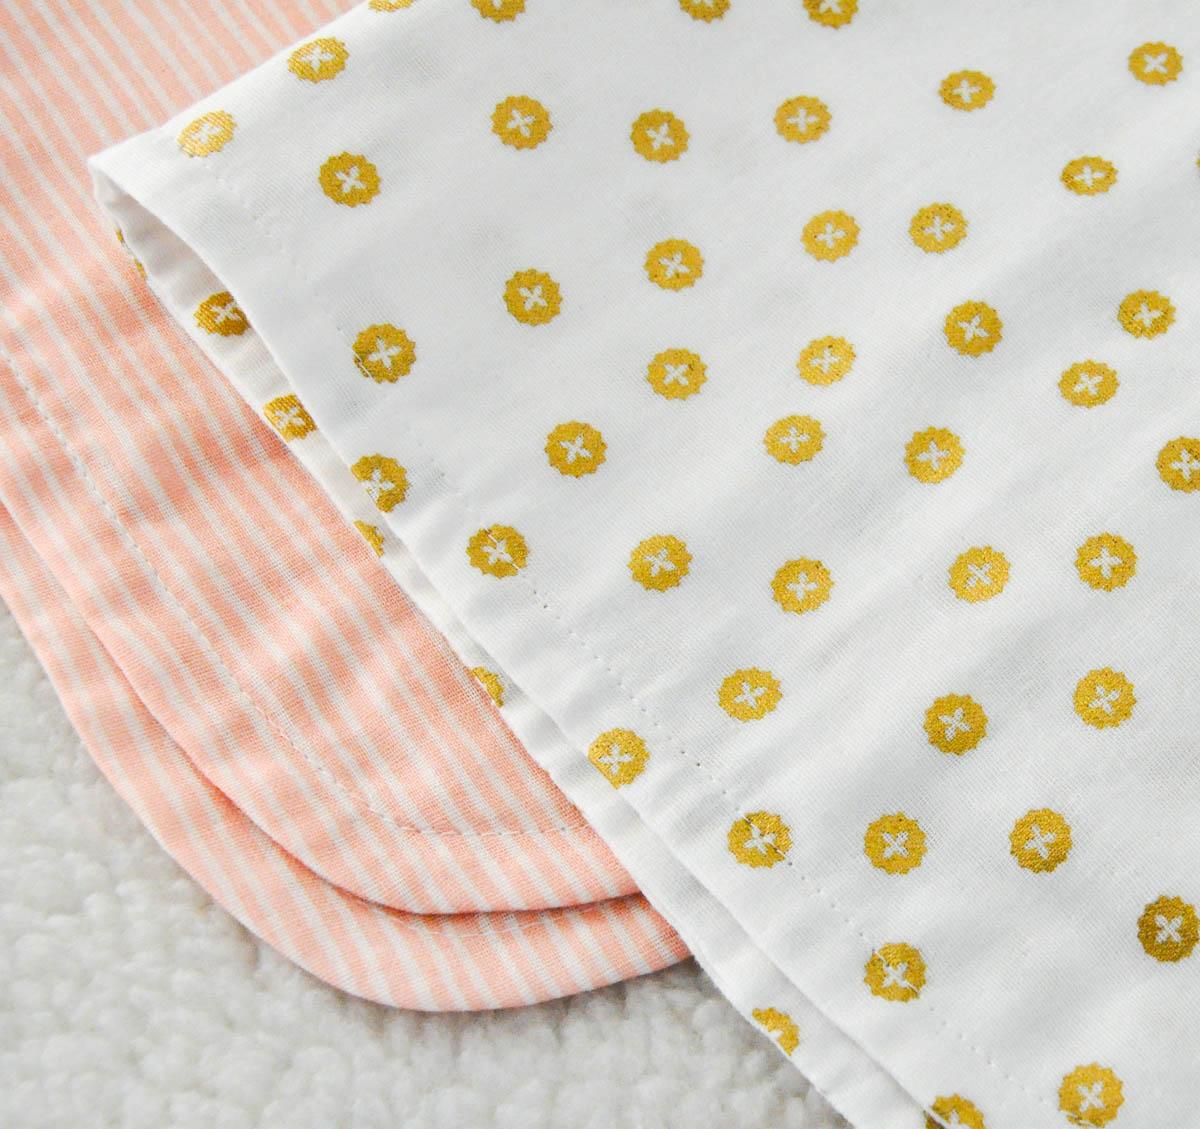 Burp cloths for baby girl telafante double gauze burp cloth tutorial 10 of 1 baditri Image collections